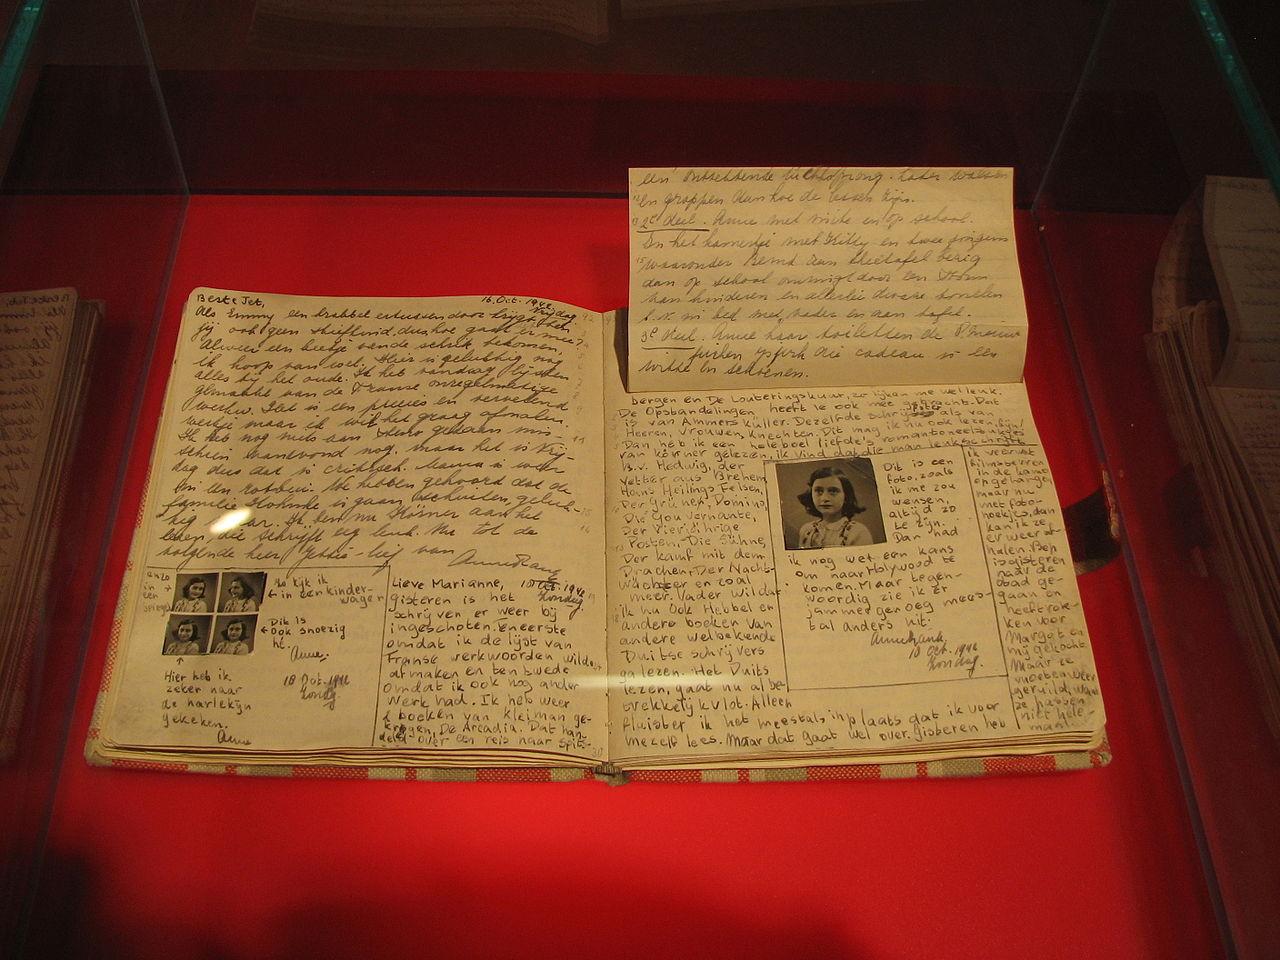 Anna Frank fu scoperta per caso dai nazisti